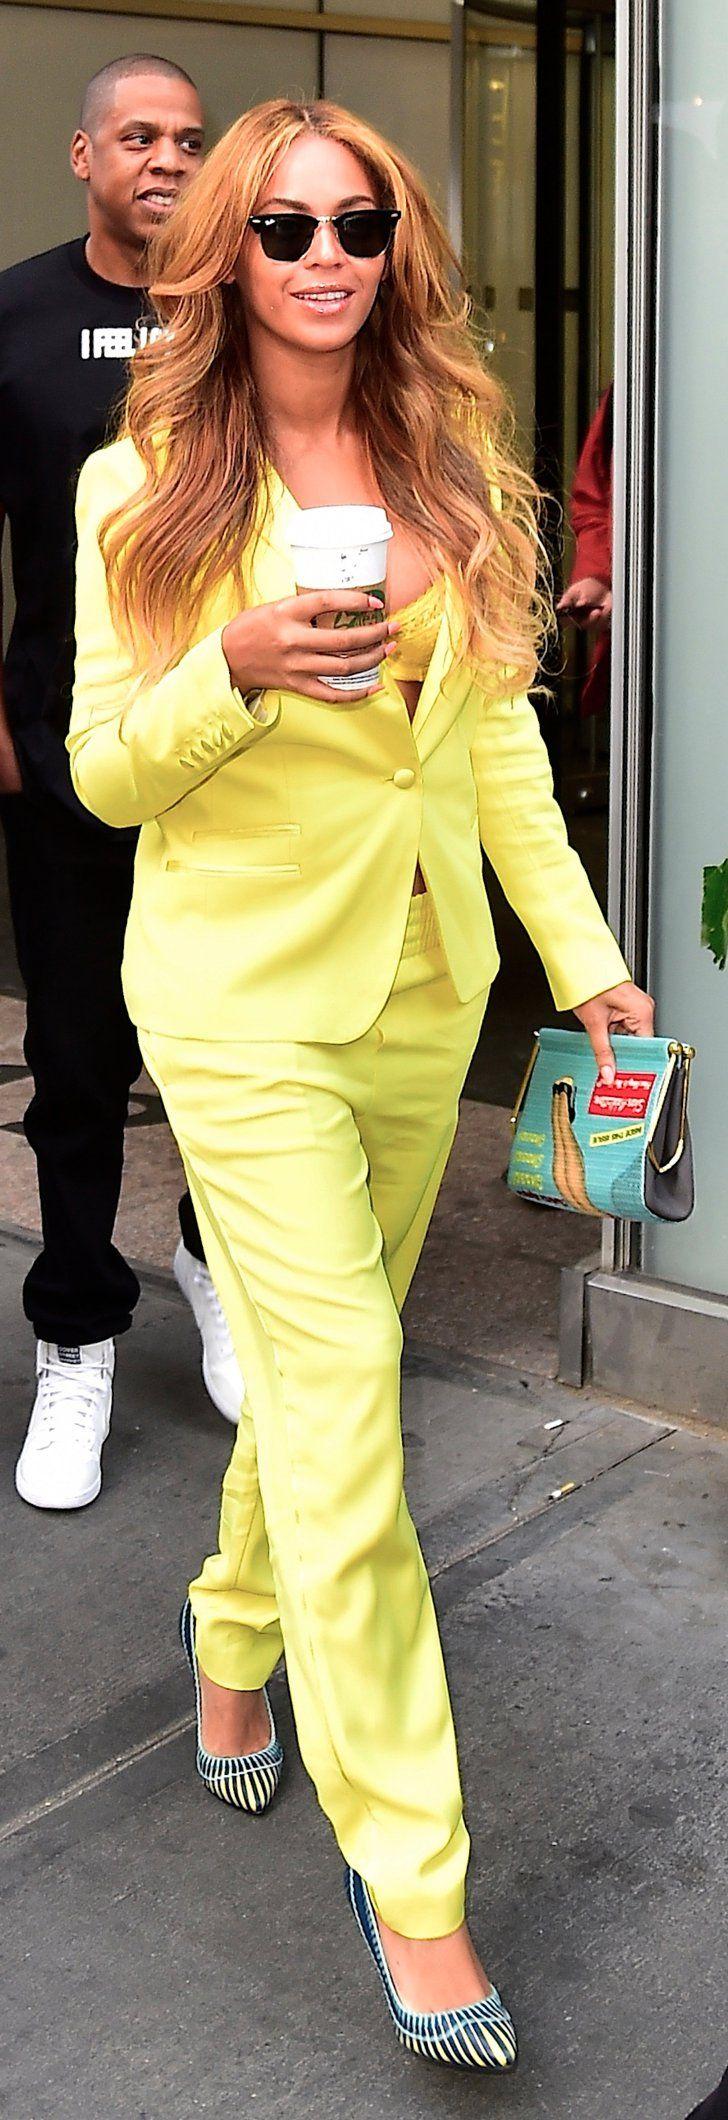 Pin for Later: Beyoncé's Yellow Suit Is Sssssmokin'